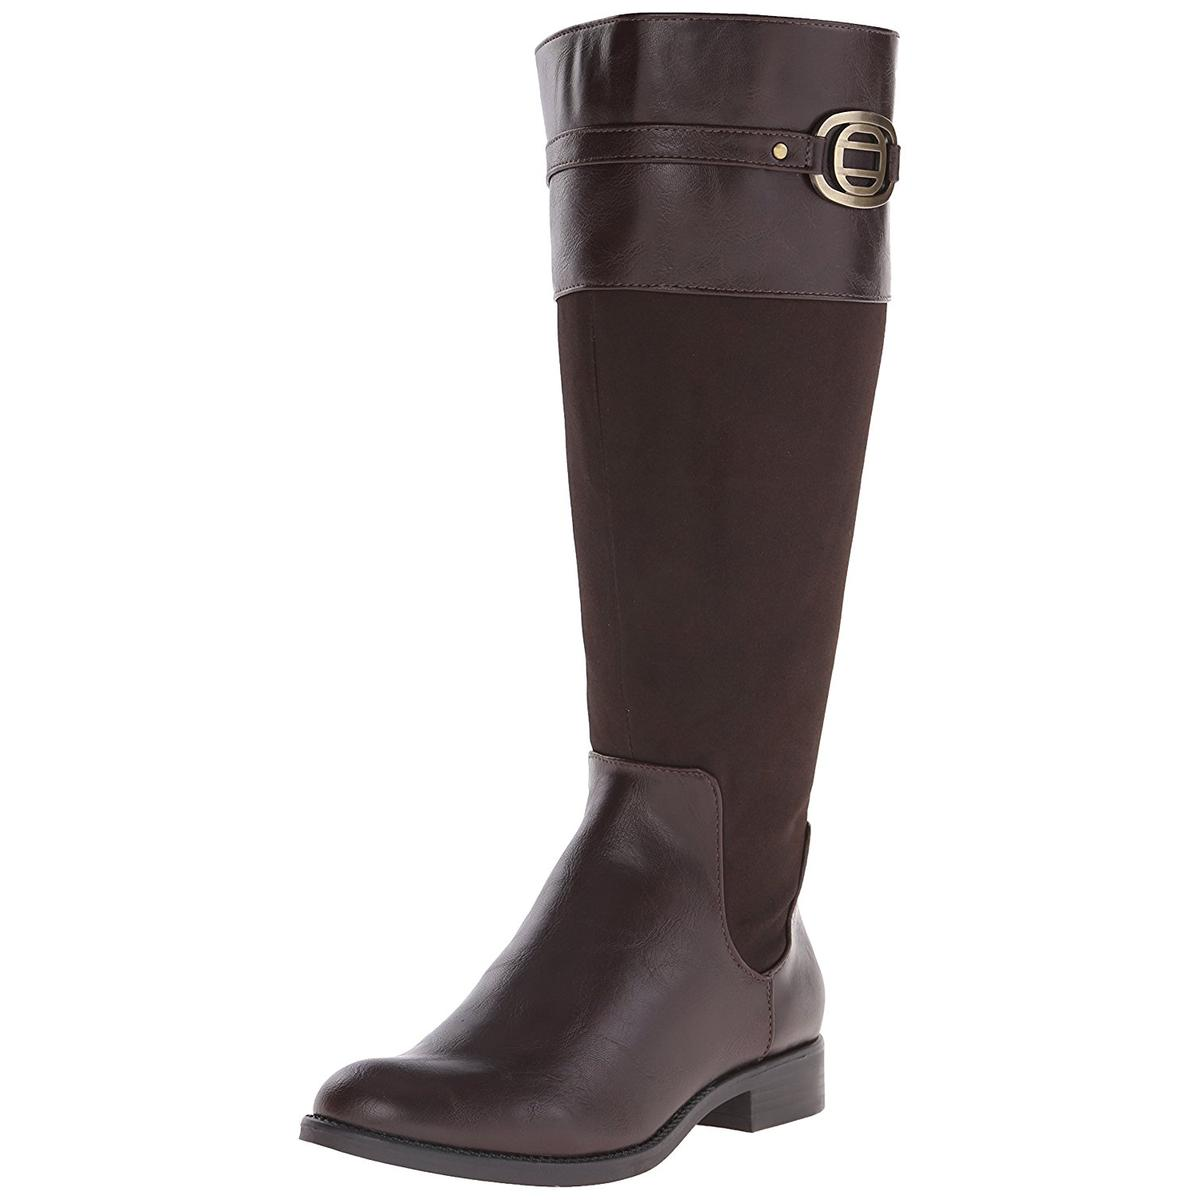 Lifestride Ravish Womens Dark Chocolate Boots by LifeStride